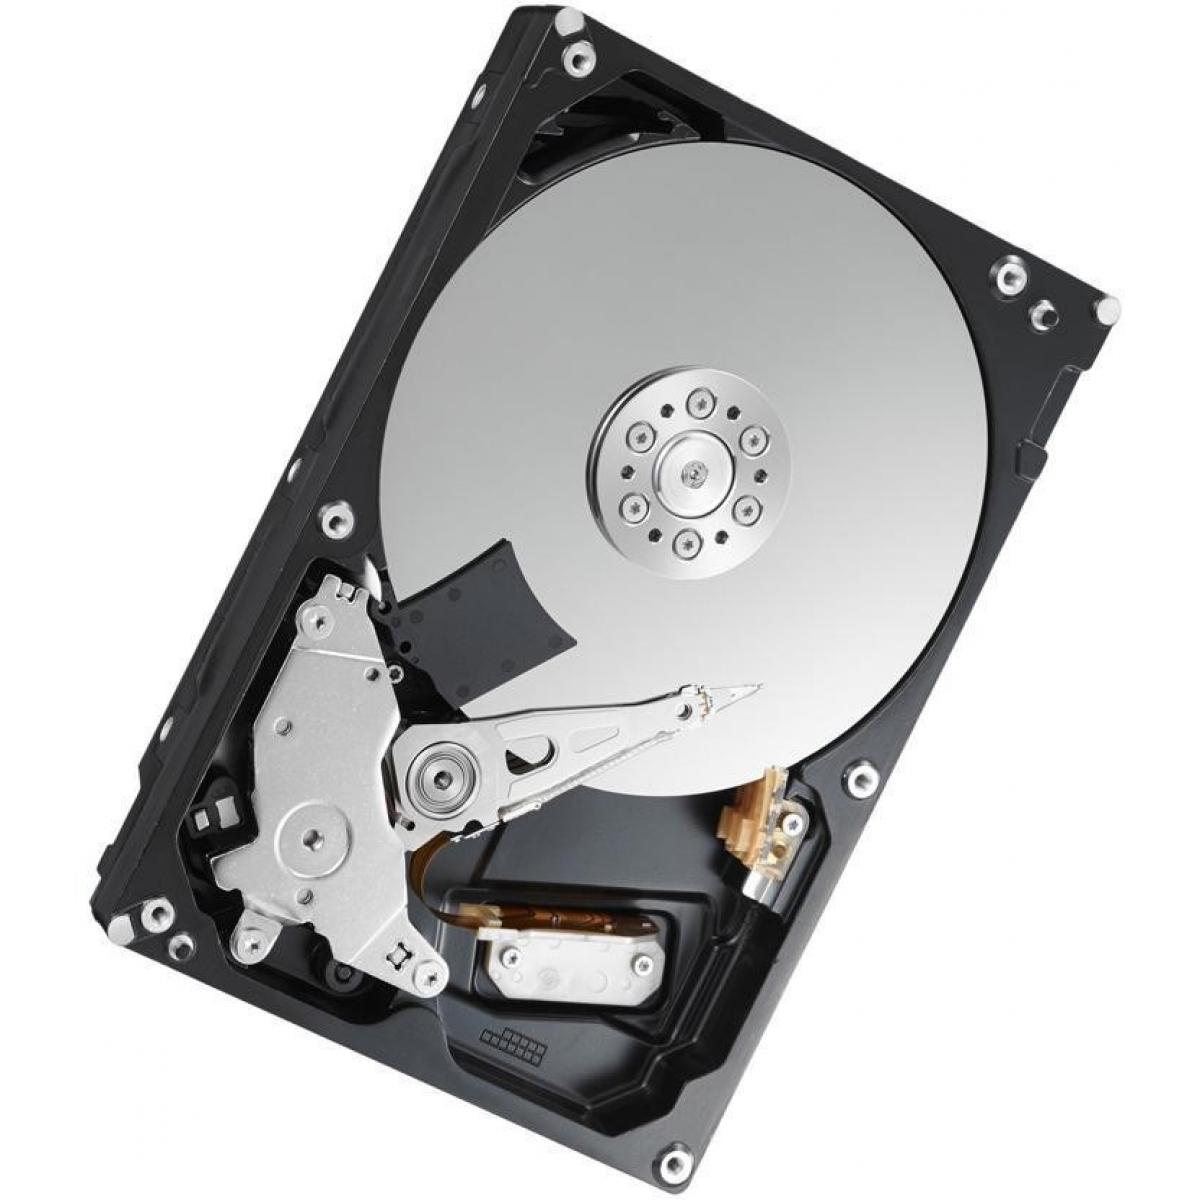 HD Toshiba P300 3TB, Sata III, 7200RPM, 64MB, HDWD130UZSVA